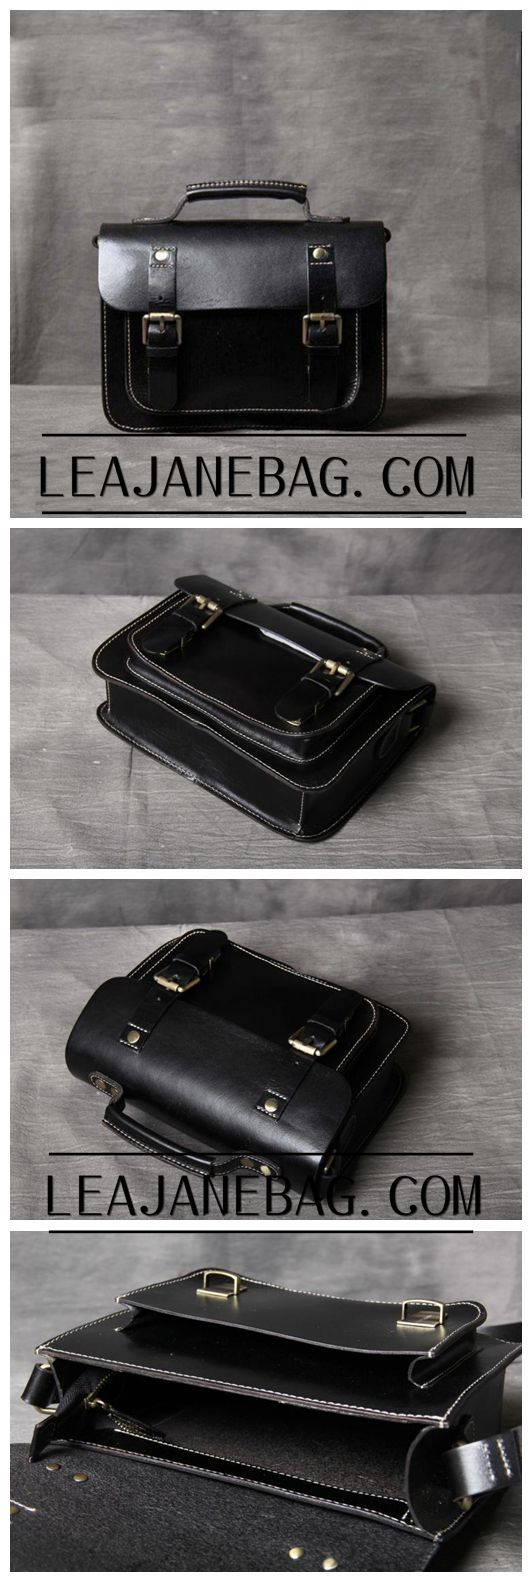 Leather Messenger Bag, Leather Briefcase, Handmade Cross-body Bag, Leather Tote Bag OAK-013